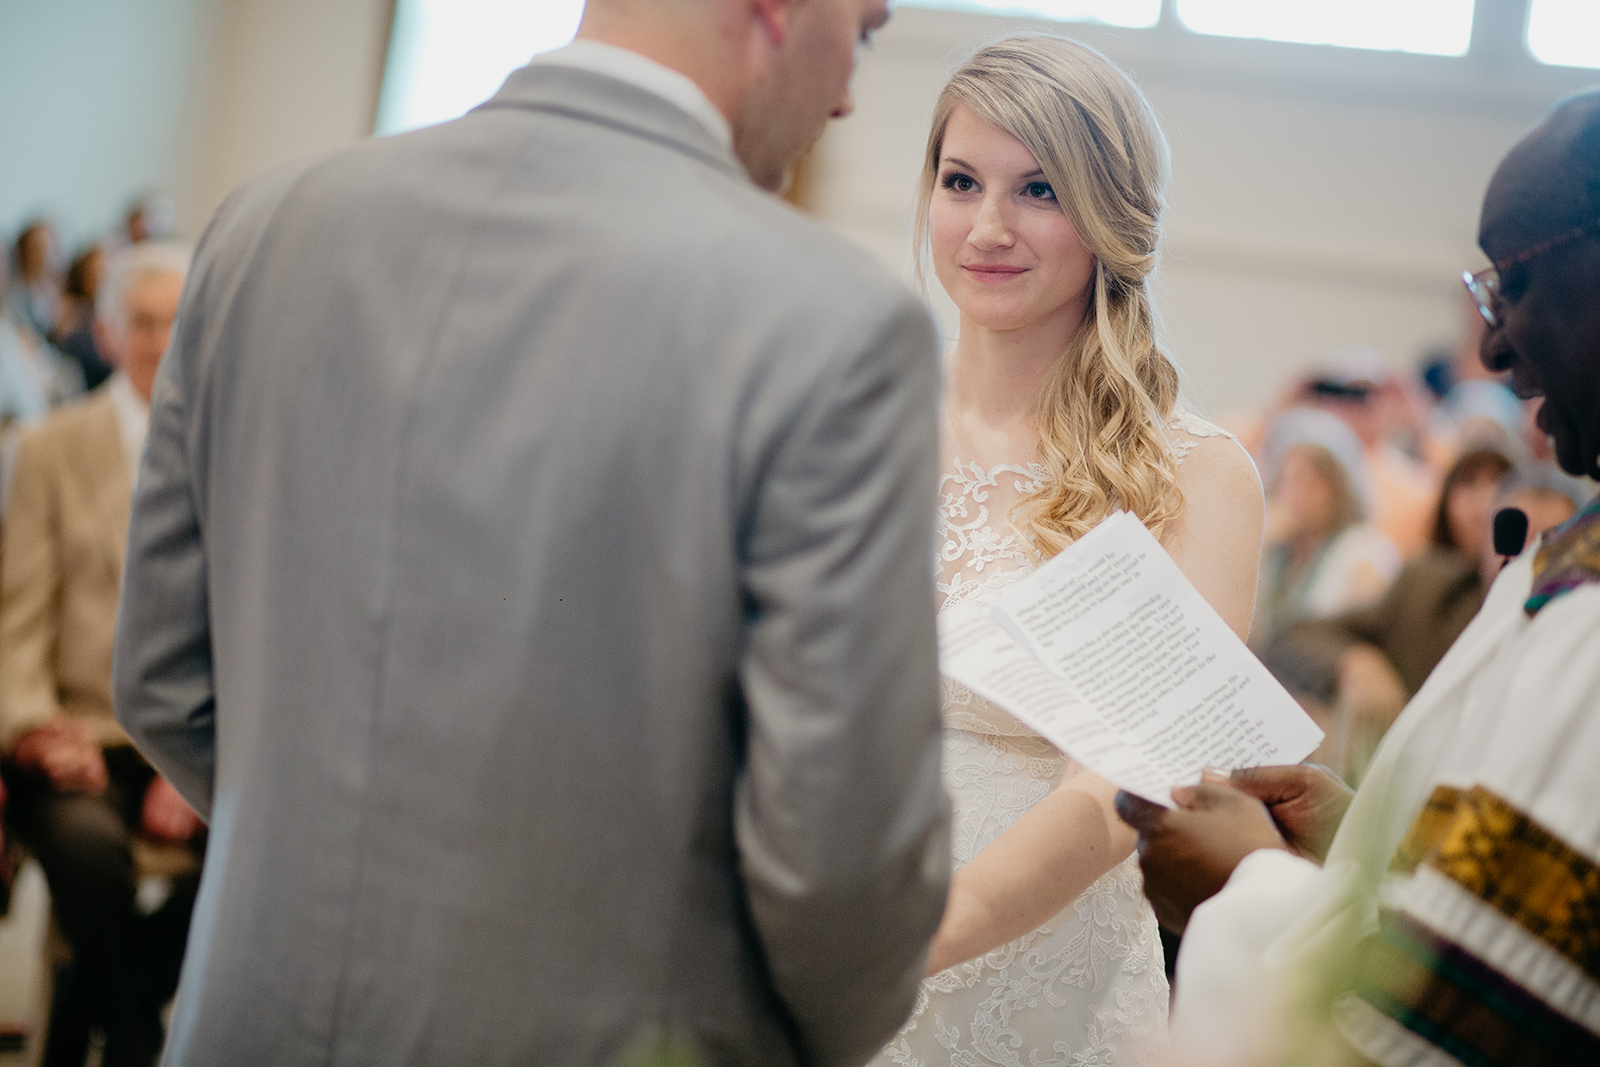 Dalton Wedding | The Barn at Edgewood, Standardsville |  Amy Jackson Photography